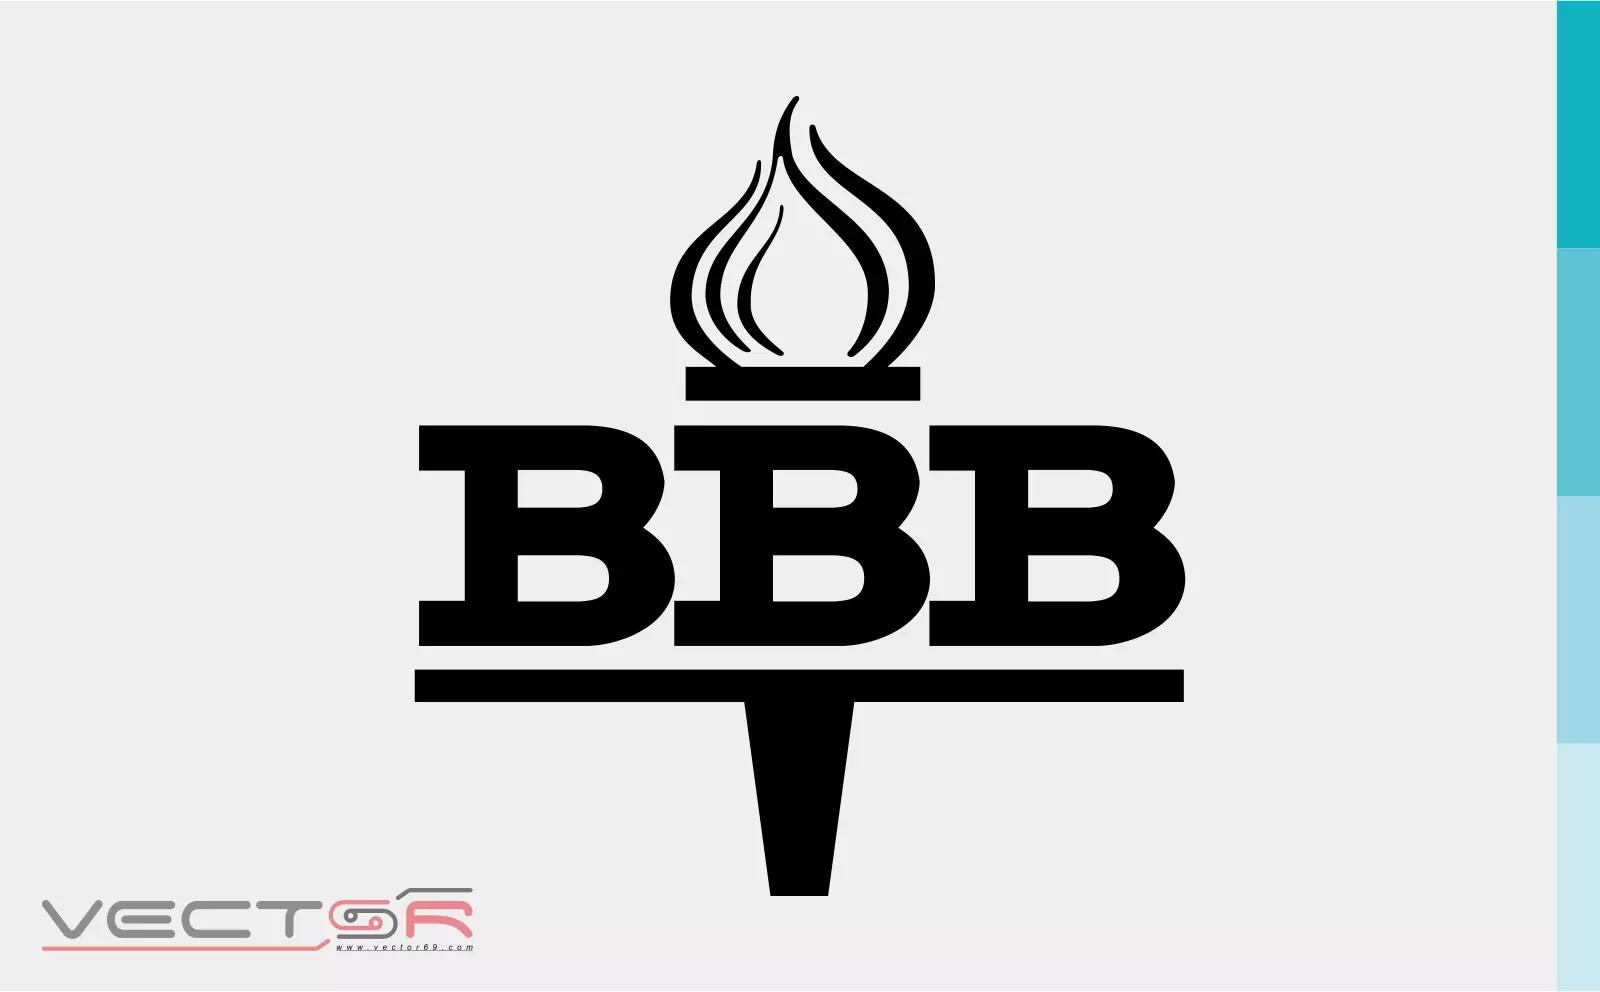 BBB - Better Business Bureau (1965) Logo - Download Vector File SVG (Scalable Vector Graphics)